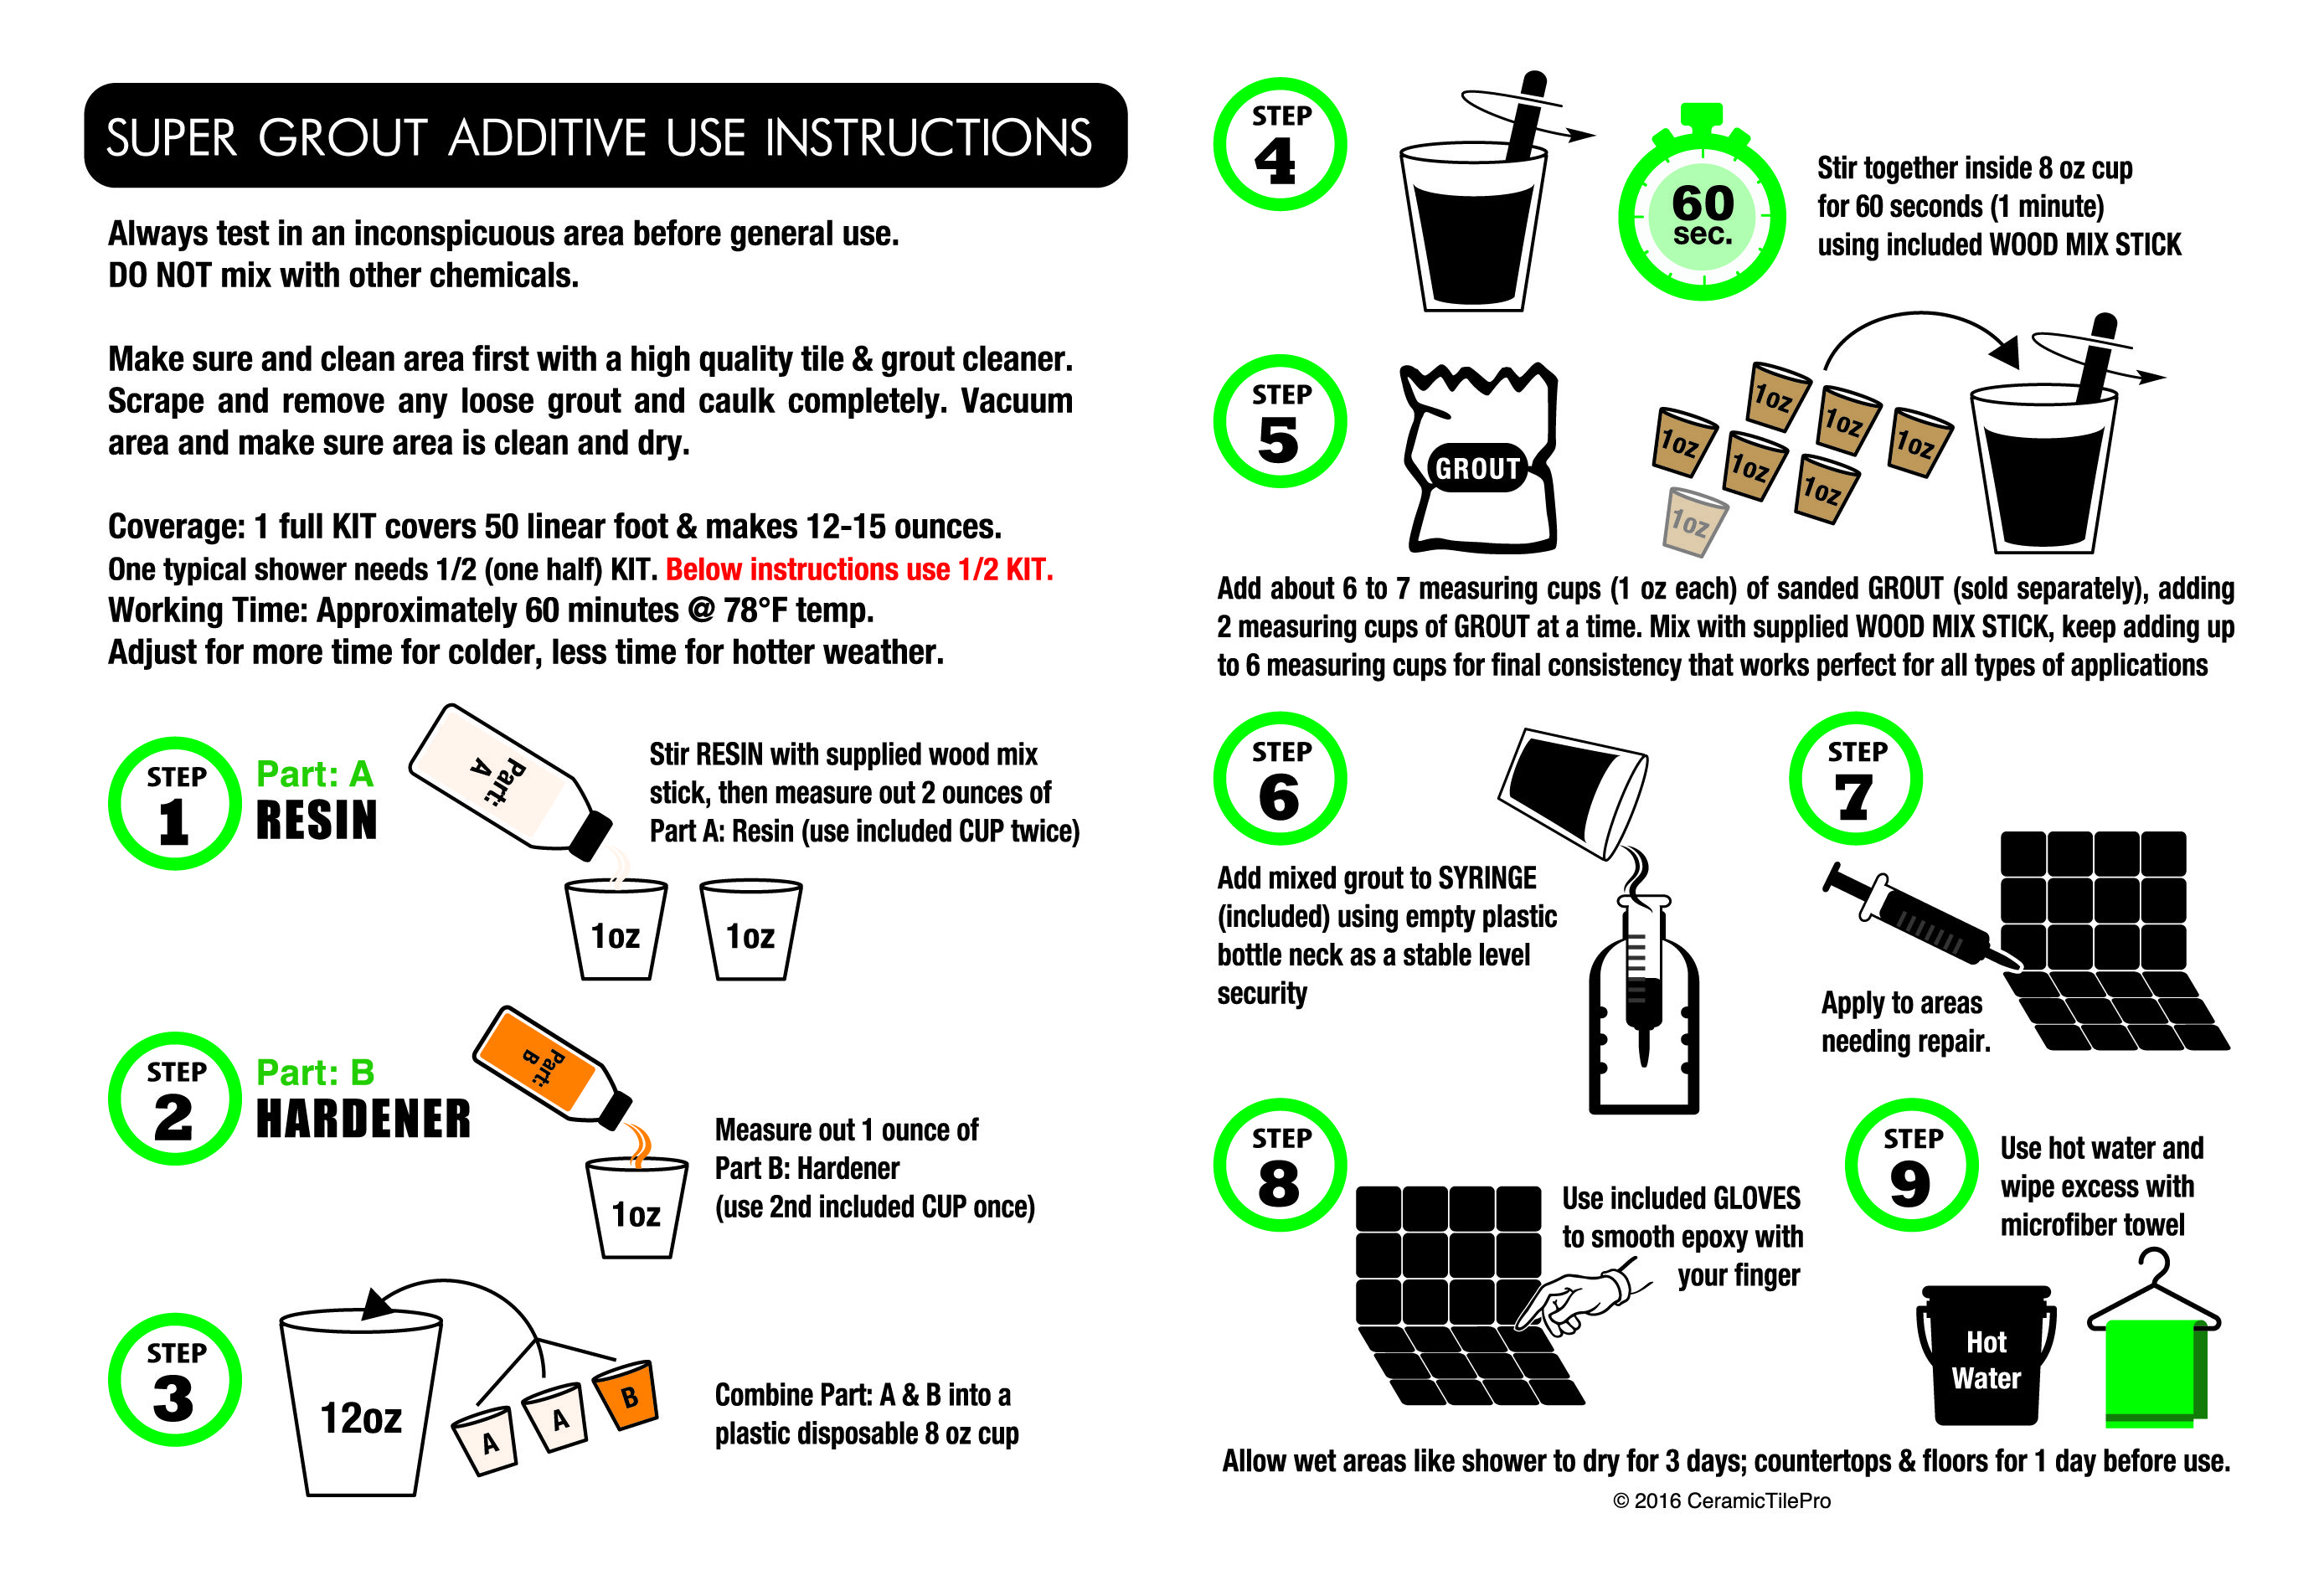 Ceramictilepro super grout additive use instructions